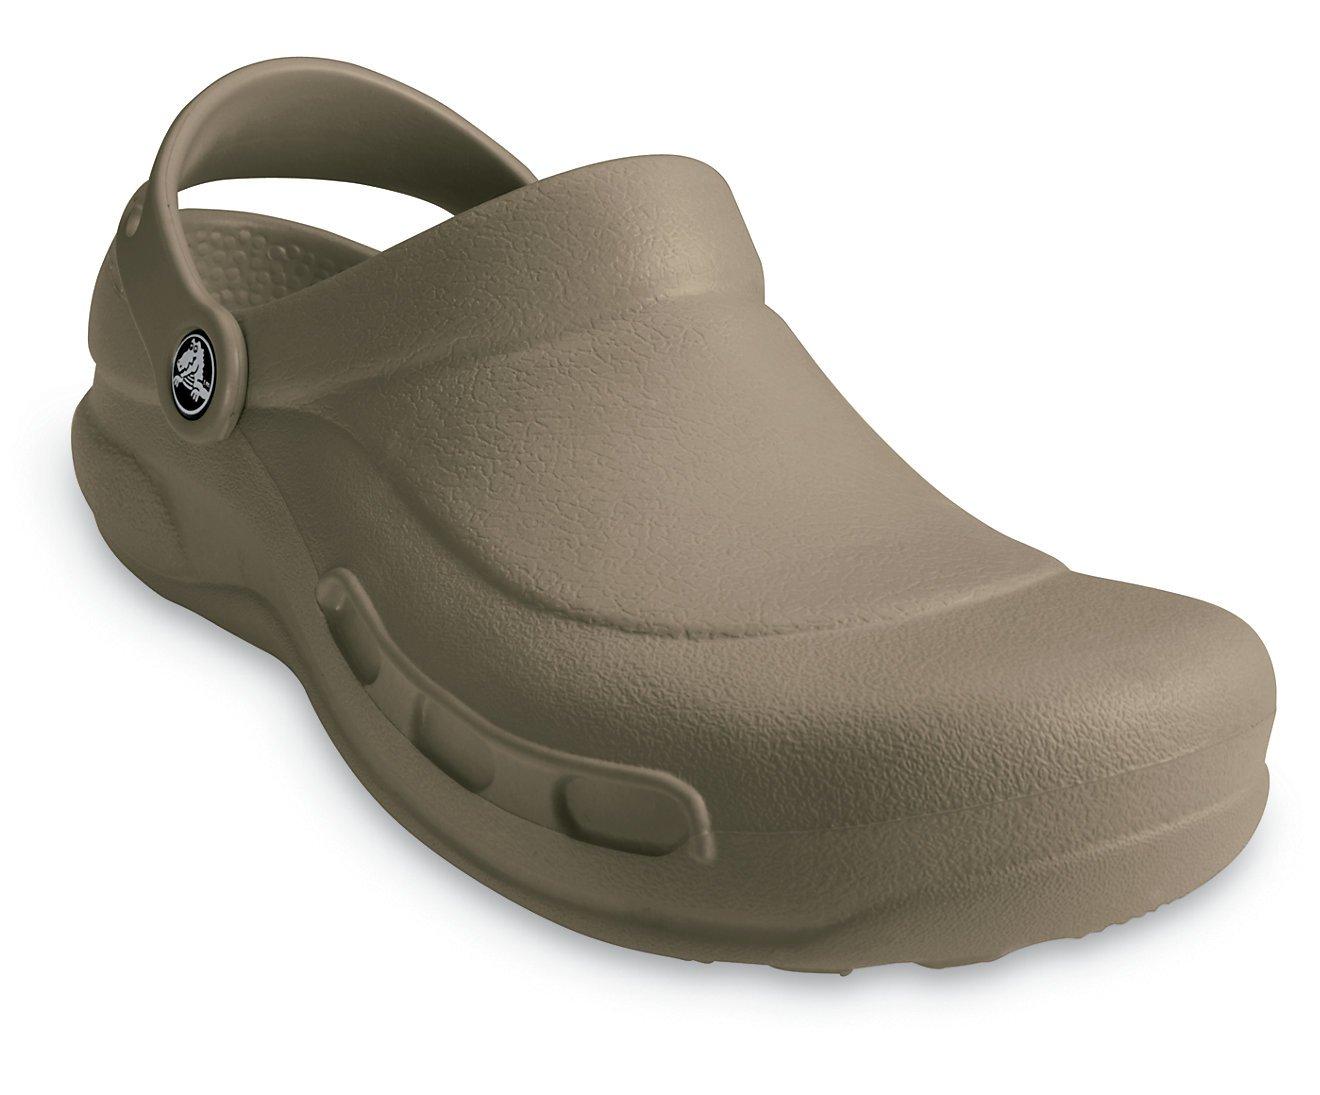 1a8b1cd87ca6 Get Quotations · Crocs Specialist Unisex Footwear